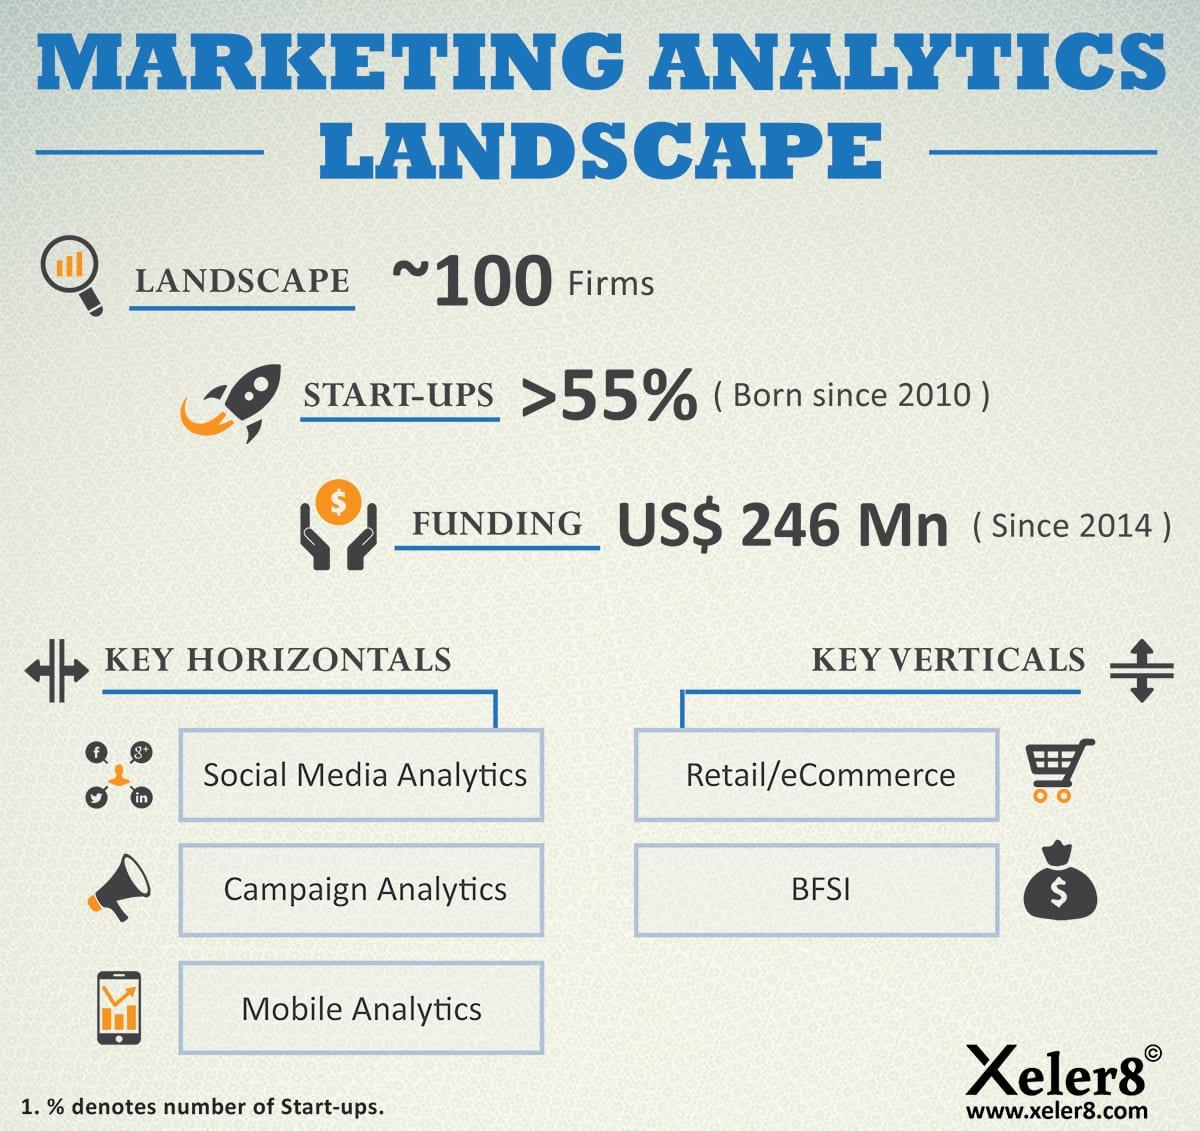 An in-depth study on MarketingAnalyticsLandscape in India